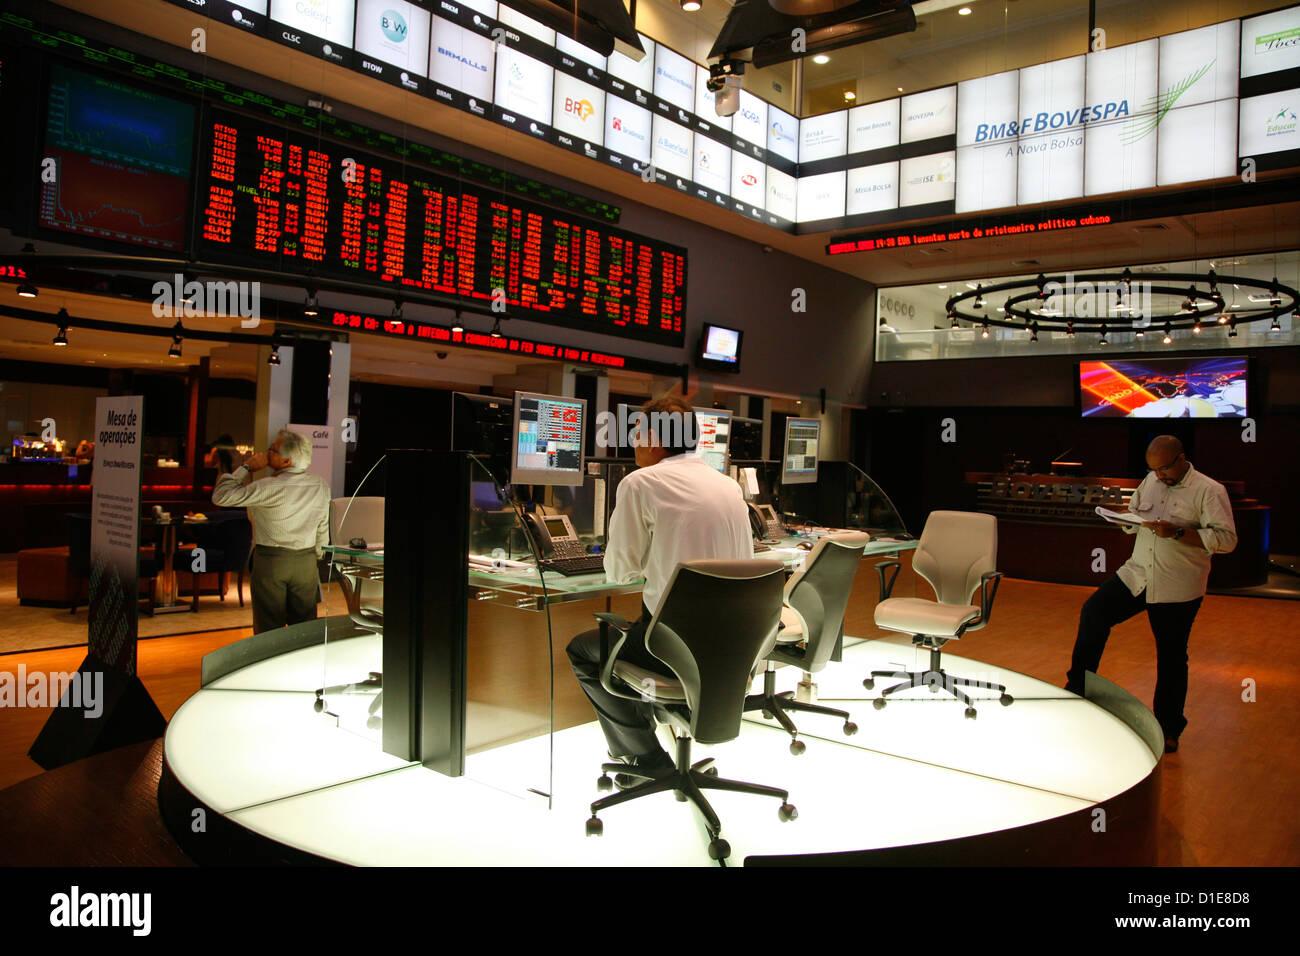 The Bovespa Stock Exchange, Sao Paulo, Brazil, South America - Stock Image